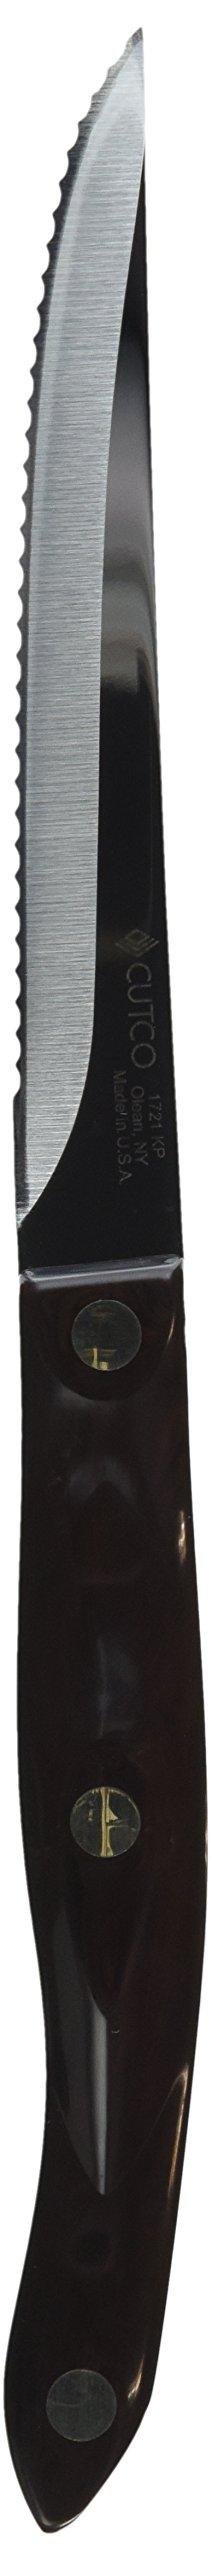 Cutco Trimmer #1721 by Cutco Cutlery